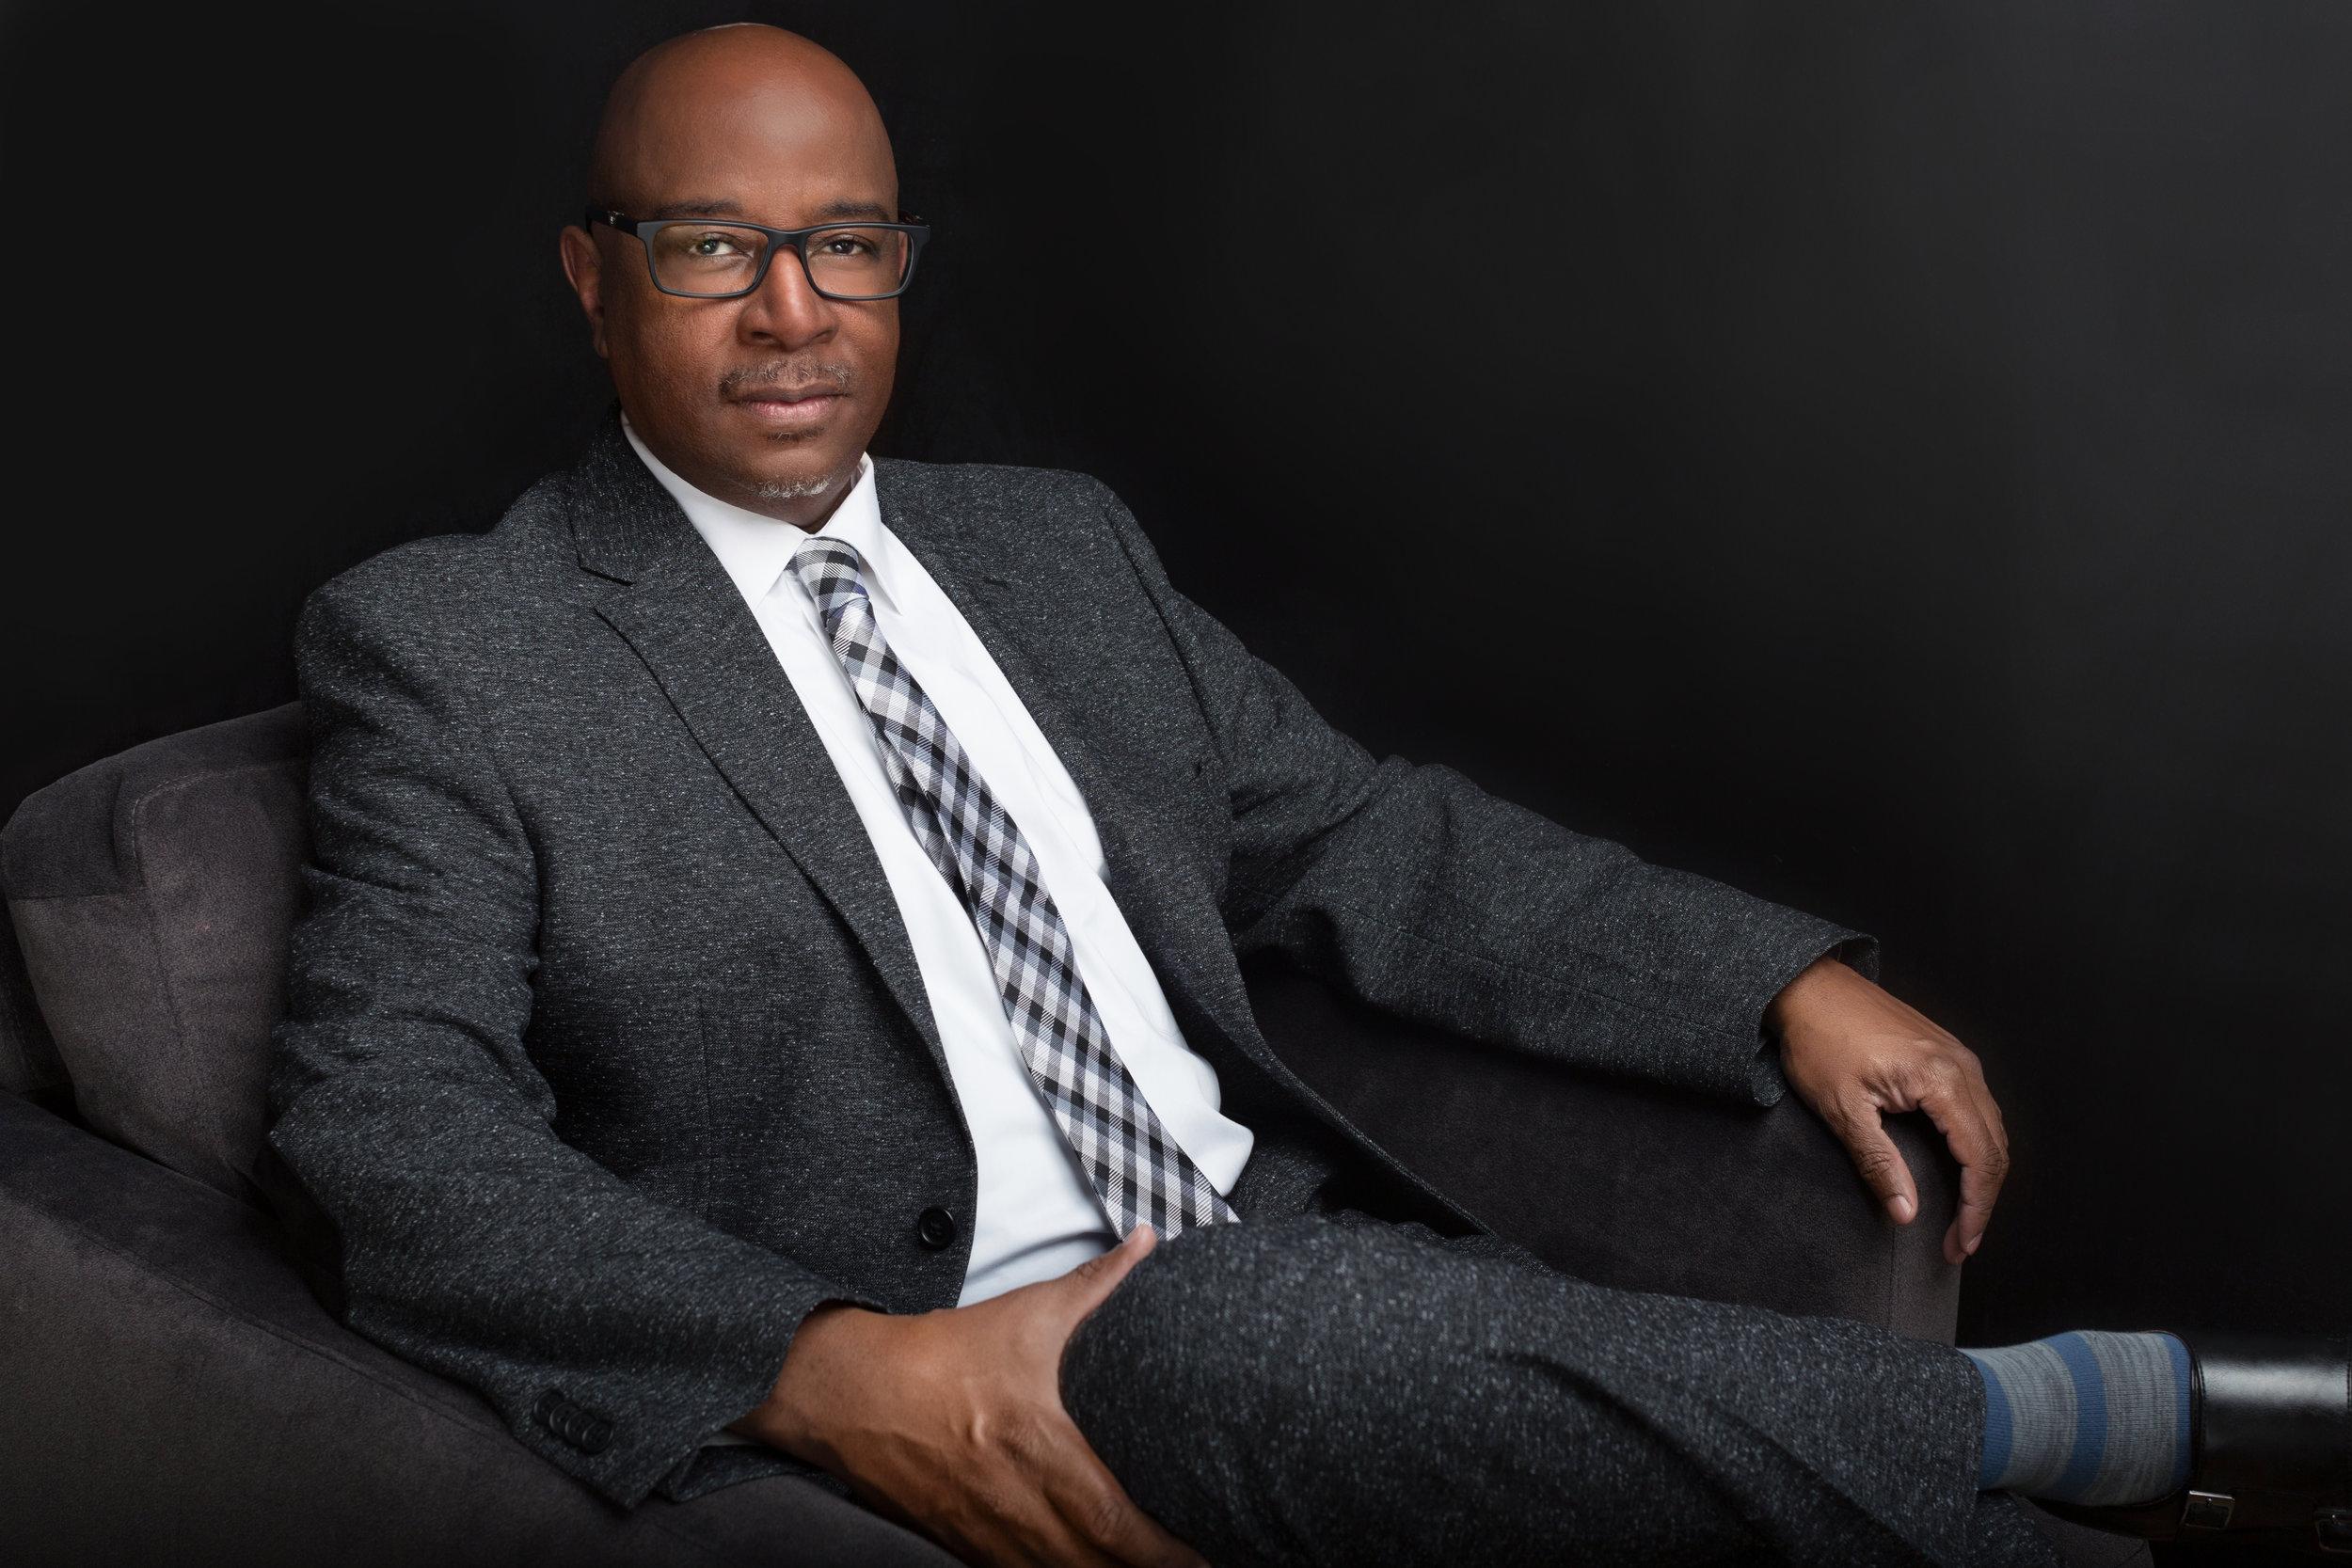 washington dc corporate headshot executive CEO professional